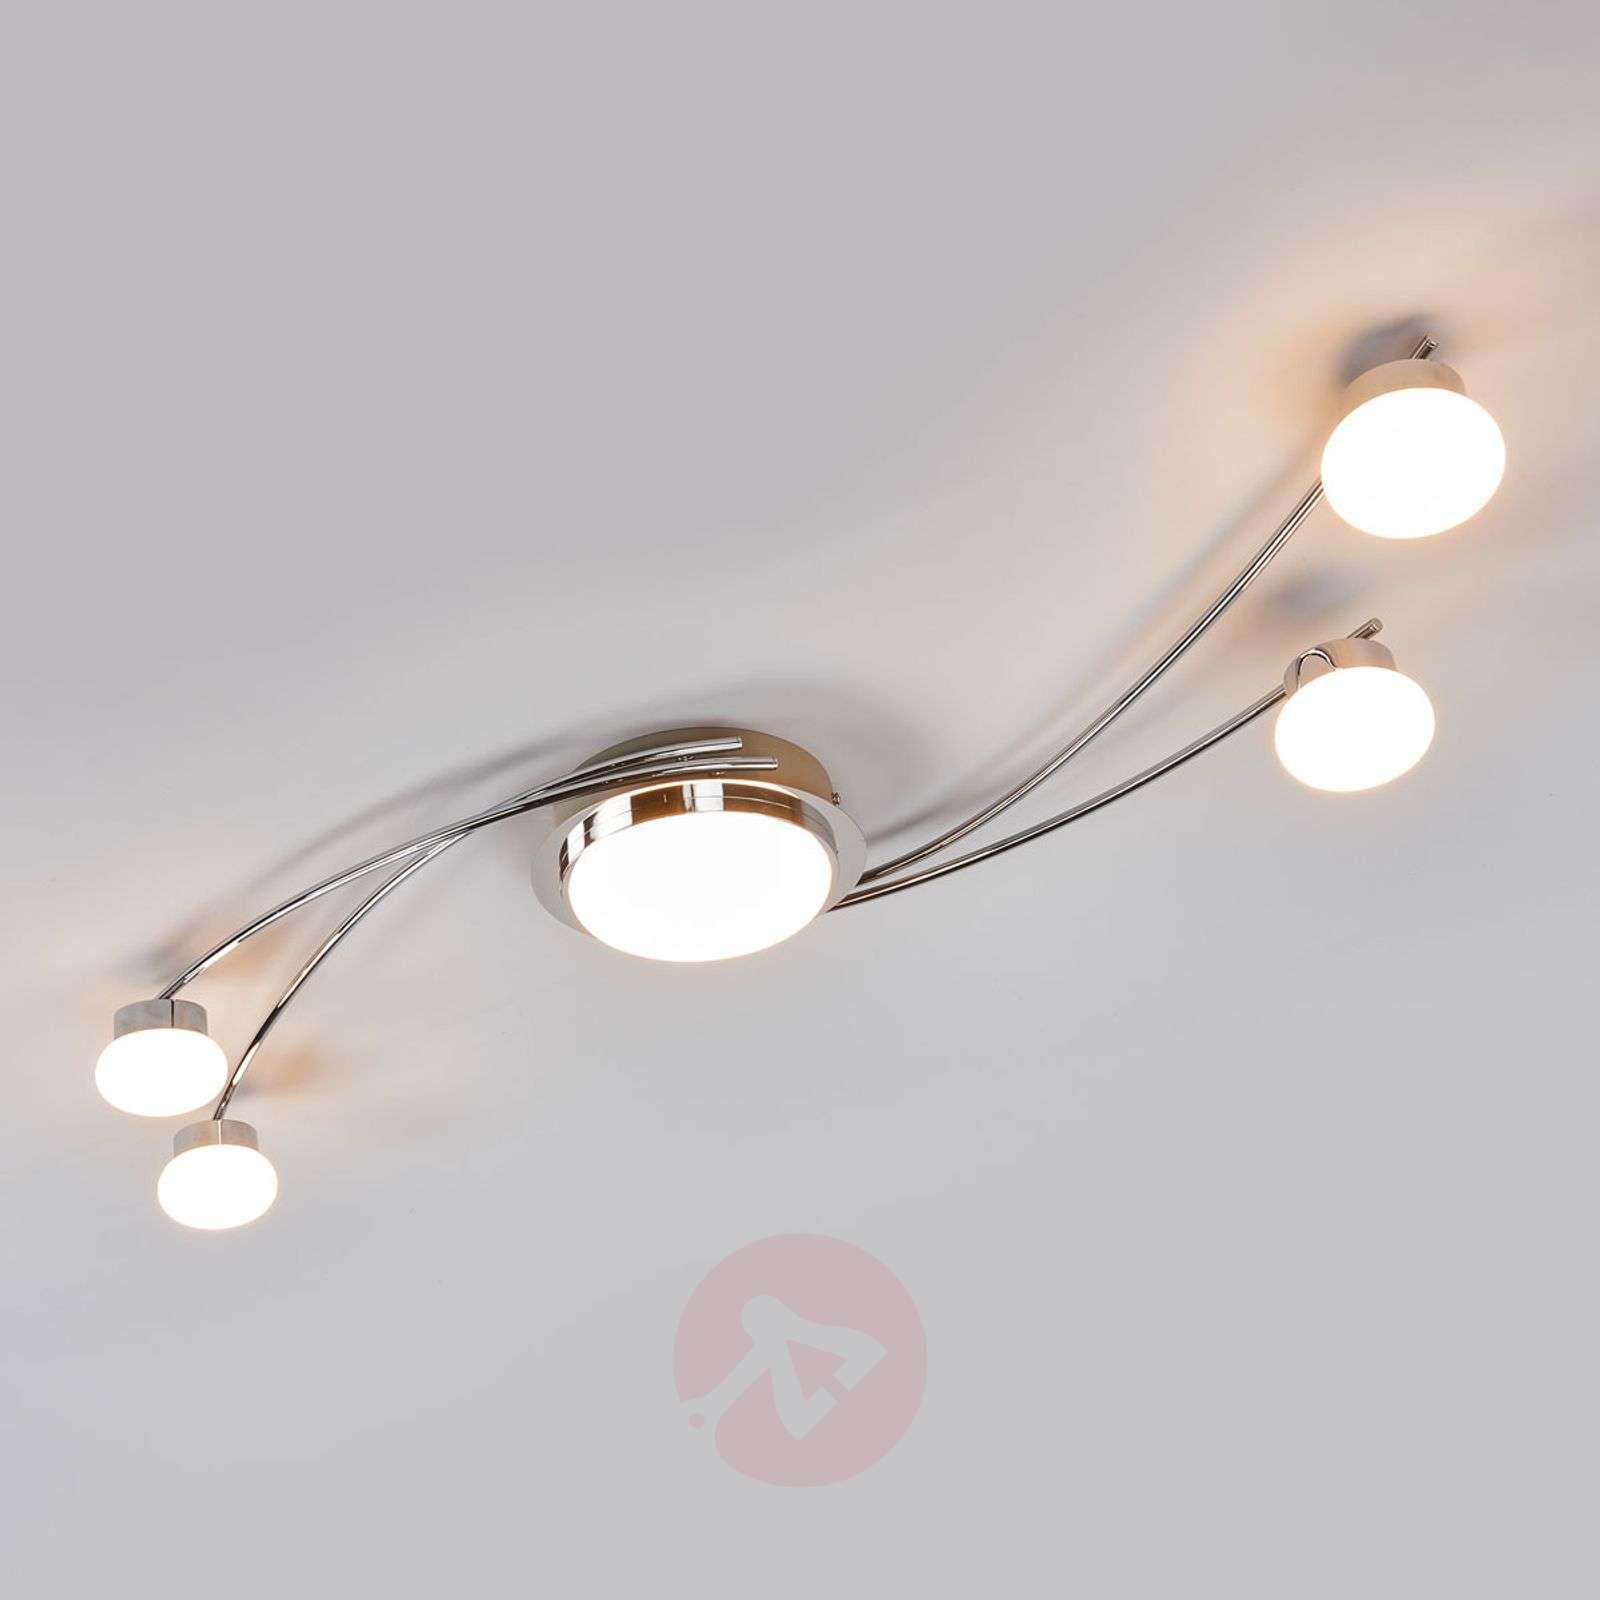 Vitus LED ceiling lamp in chrome-9994101-02